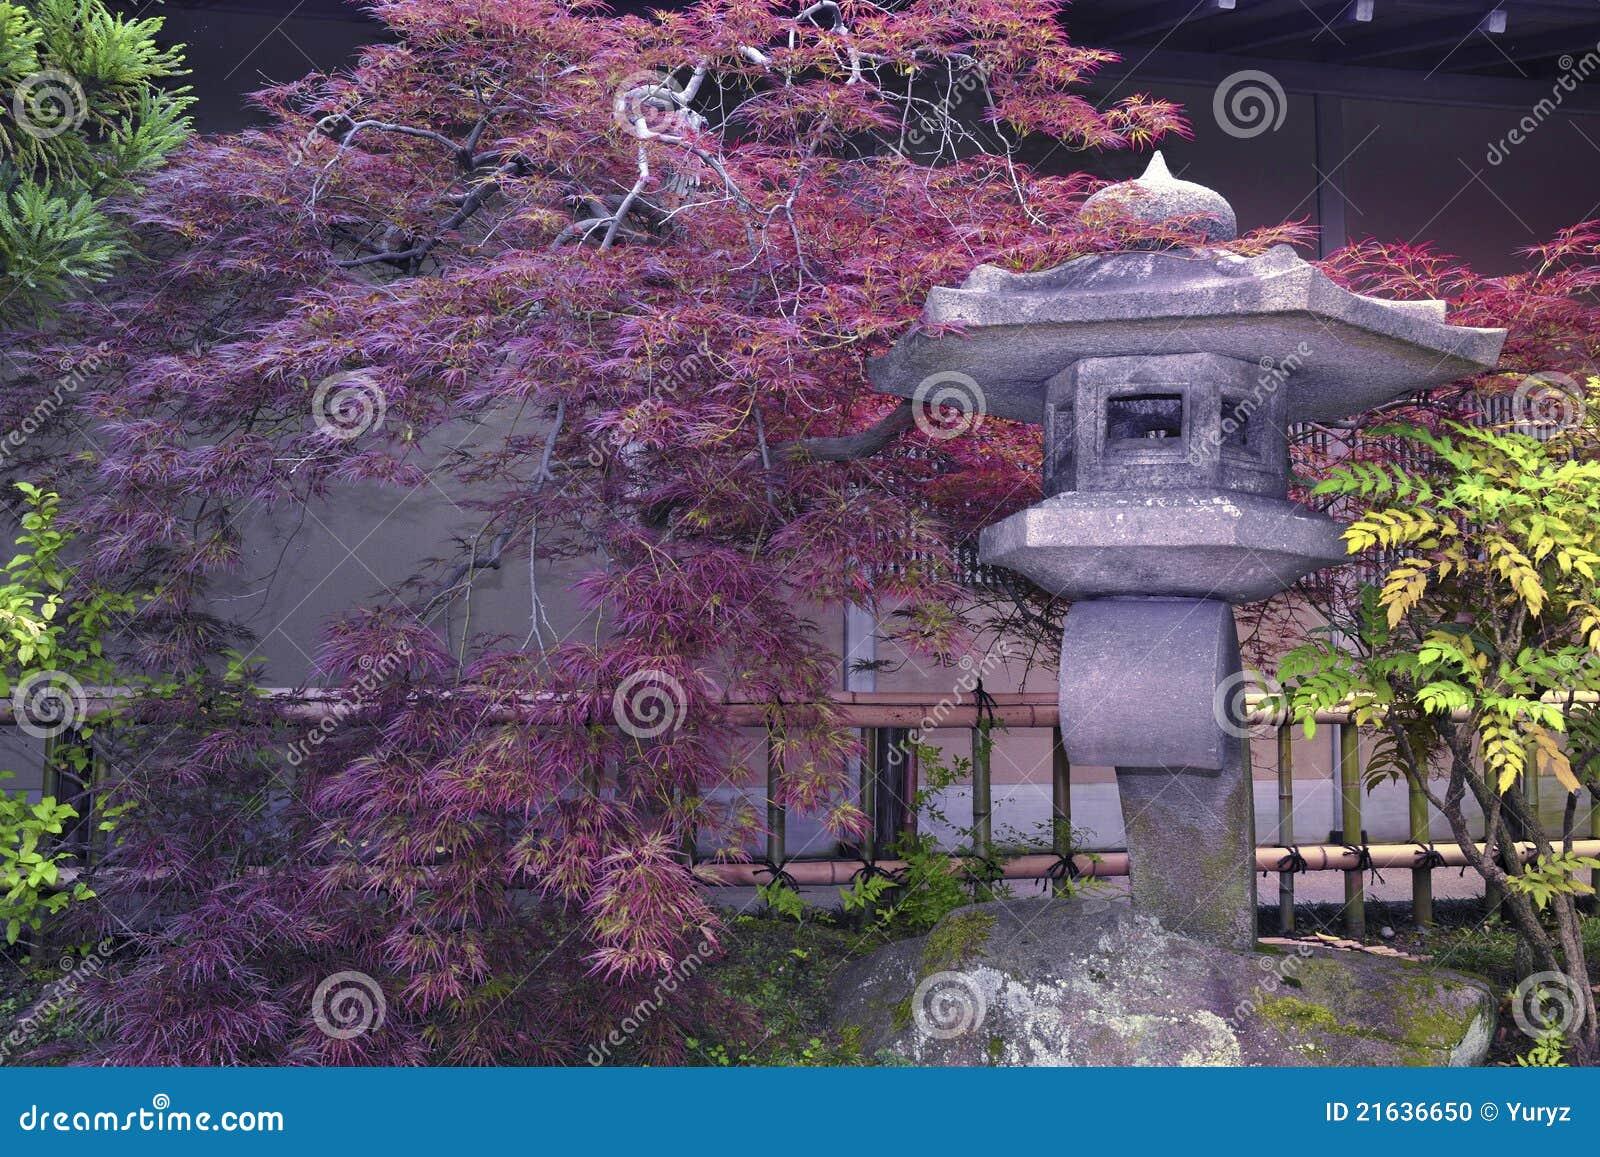 Japanischer steingarten stockfoto bild 21636650 - Japanischer steingarten ...